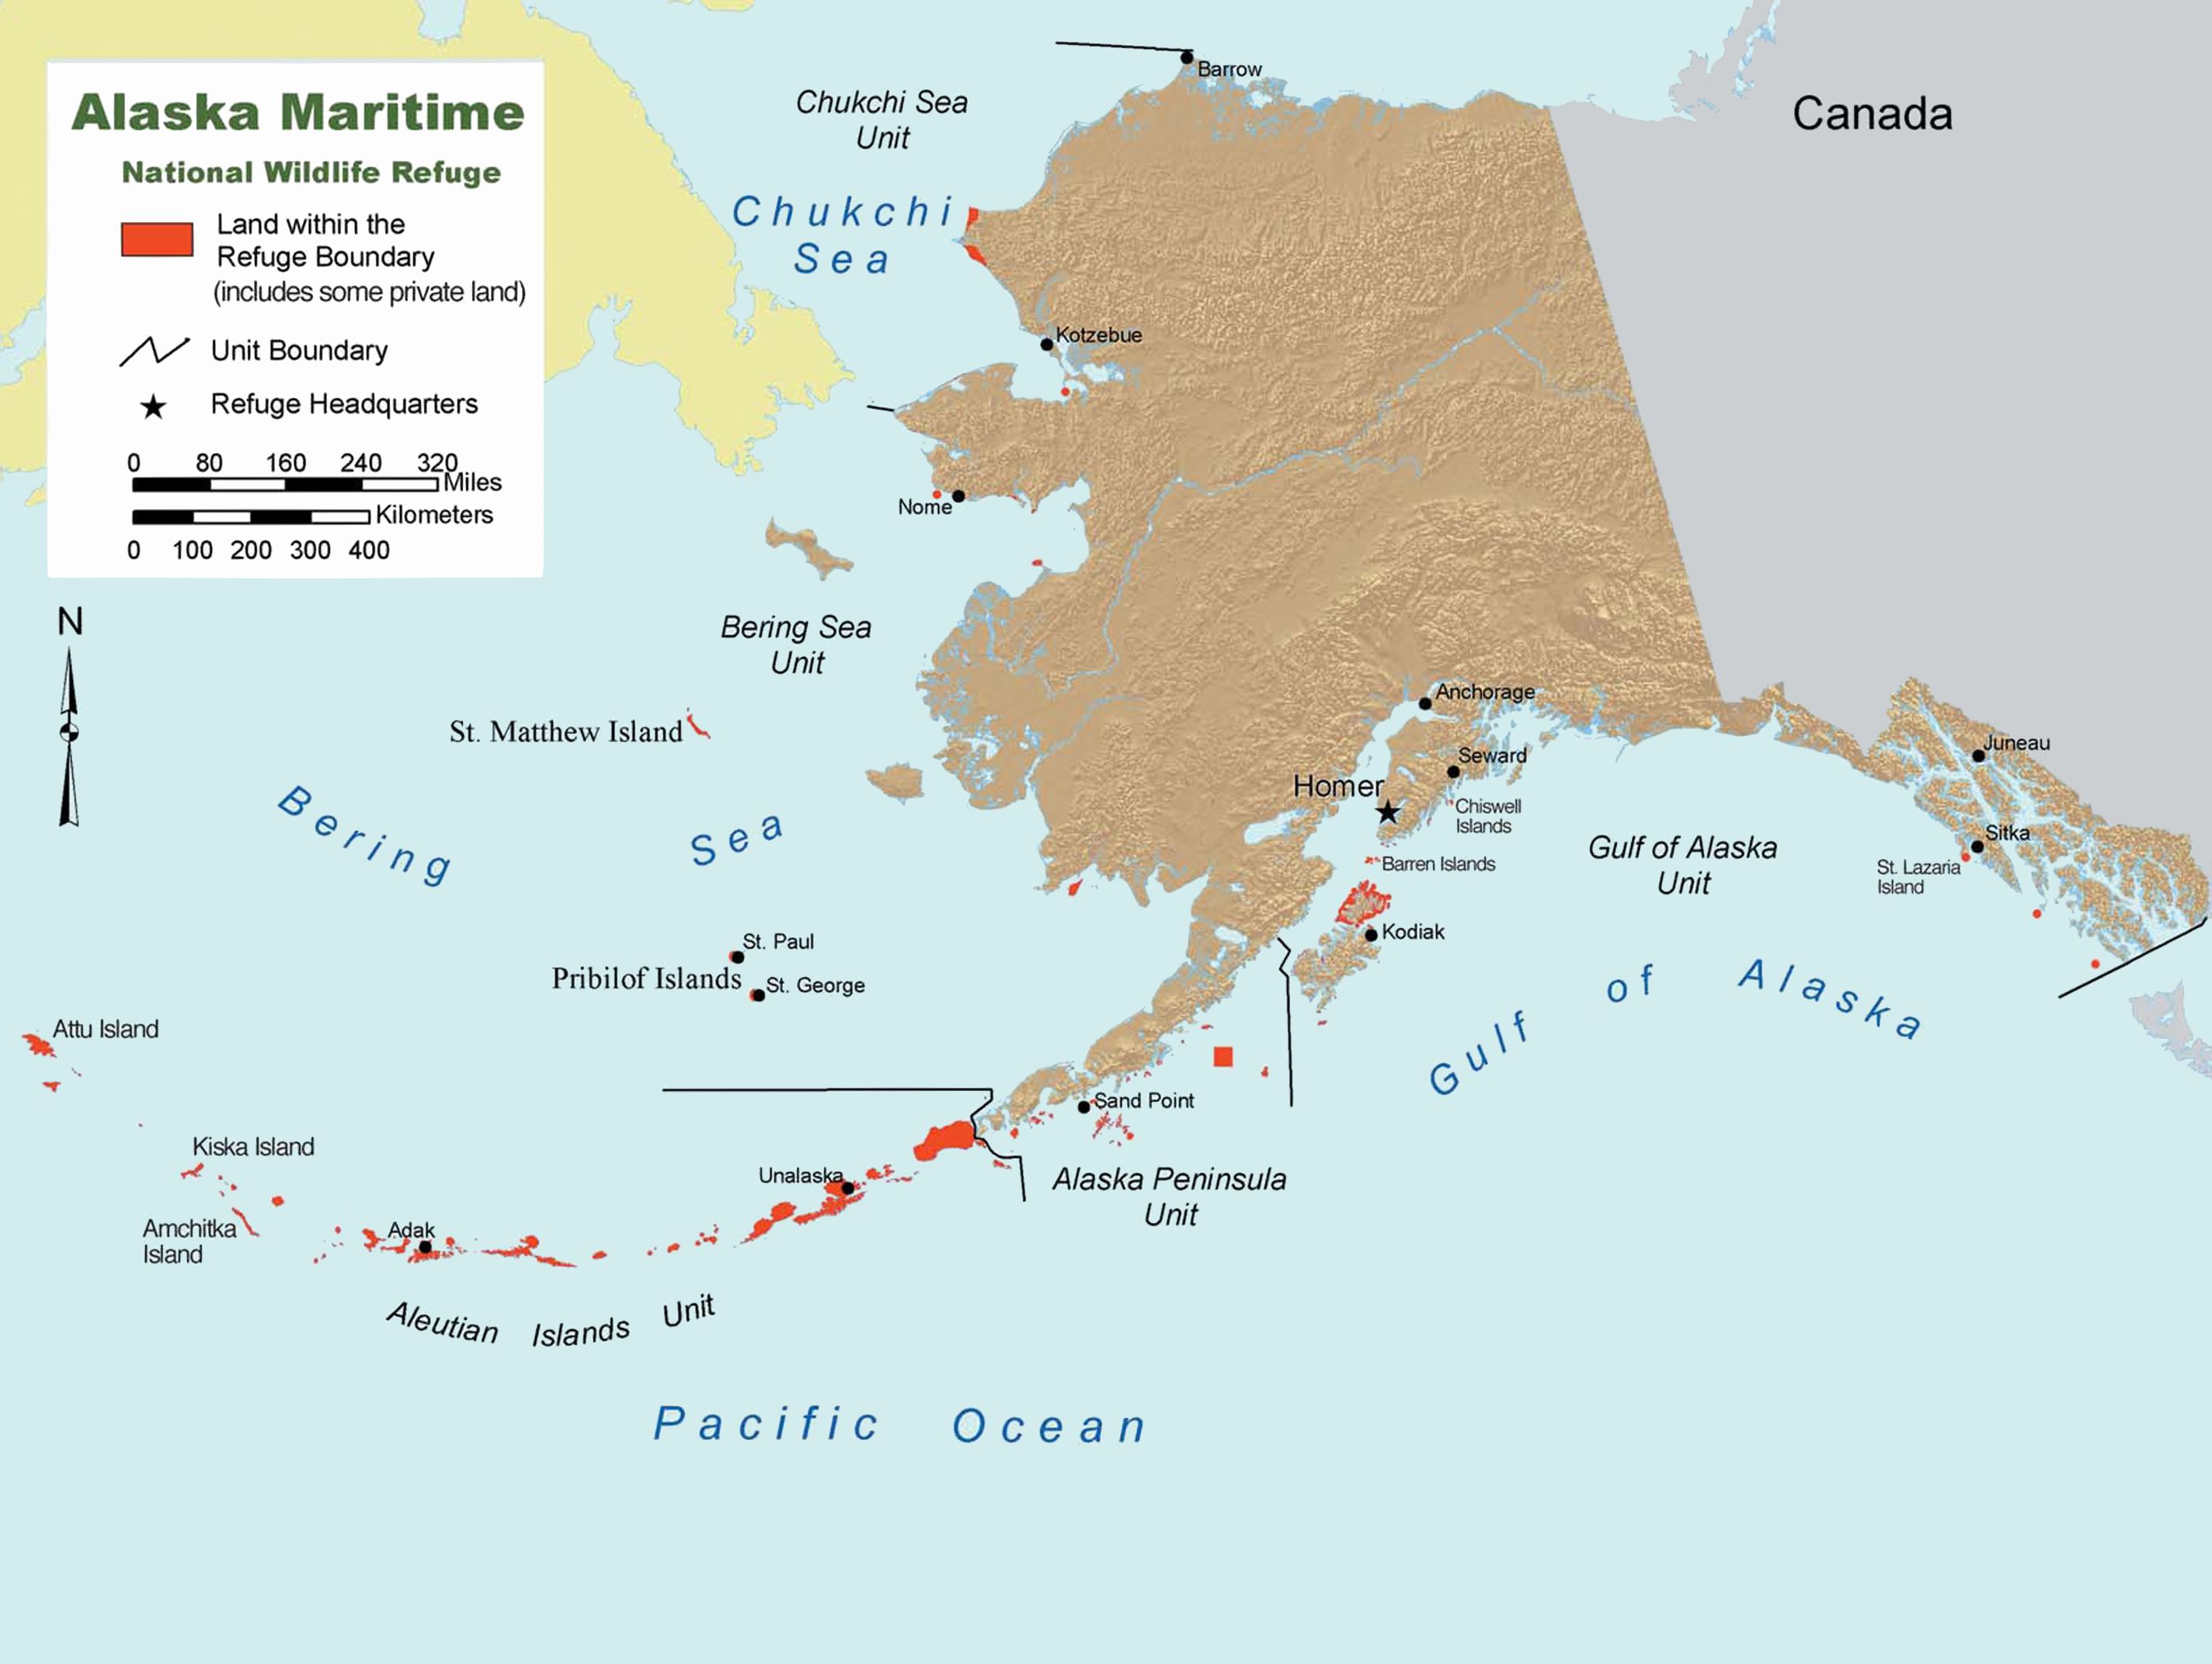 Golf Von Alaska Karte.Alaska Maritime National Wildlife Refuge Wikipedia